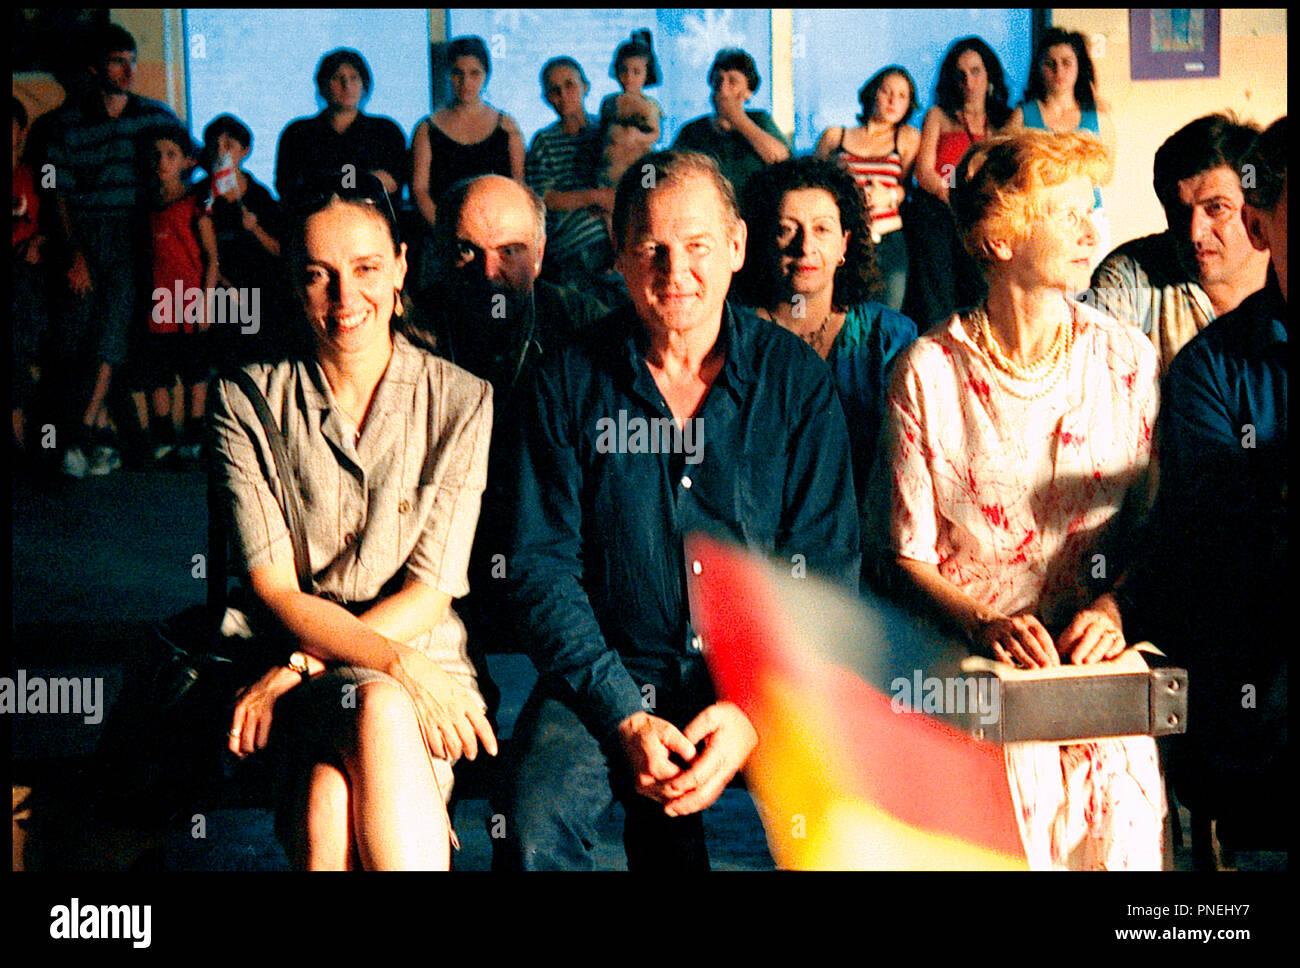 Prod DB © Tatfilm - Sanguko Films/DR L'HOMME DE L'AMBASSADE (DER MANN VON DER BOTSCHAFT) de Dito Tsintsadze 2006 ALLE. avec Marika Giorgobiani et Burghart Klaussner autre Titre: Der Mann von der Botschaft (USA) (festival Titel) Stockbild